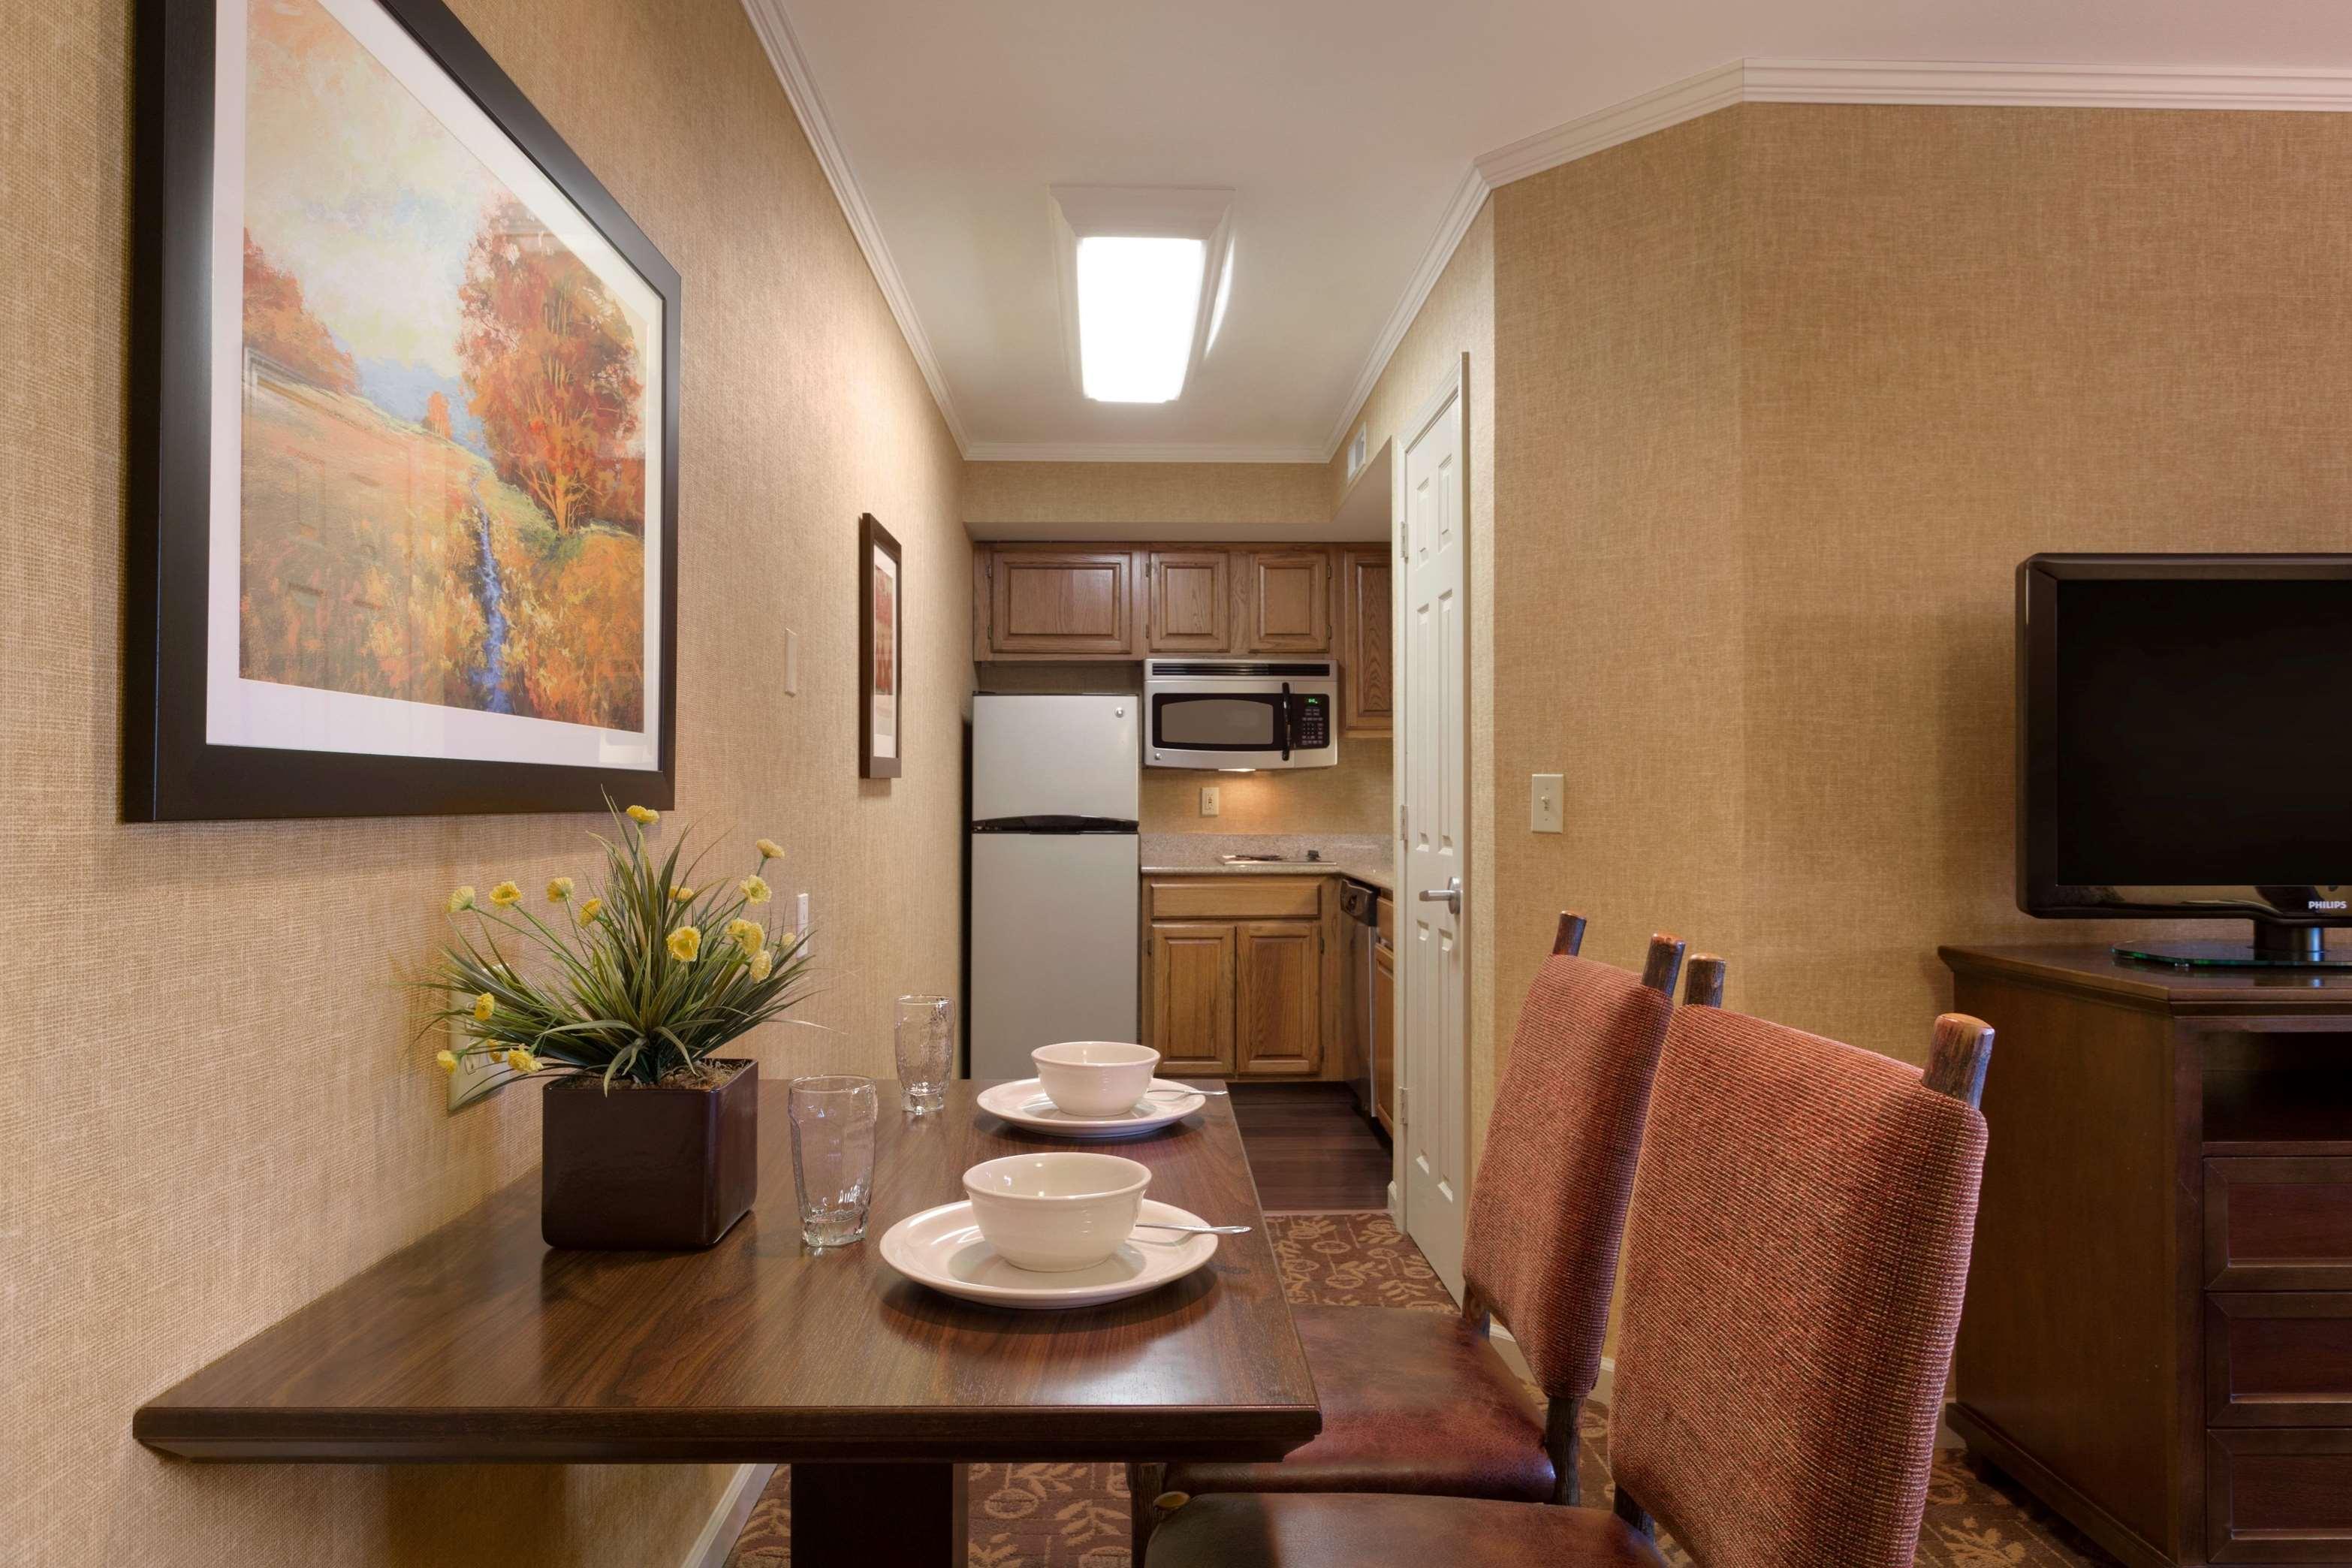 Homewood Suites by Hilton Syracuse/Liverpool image 23